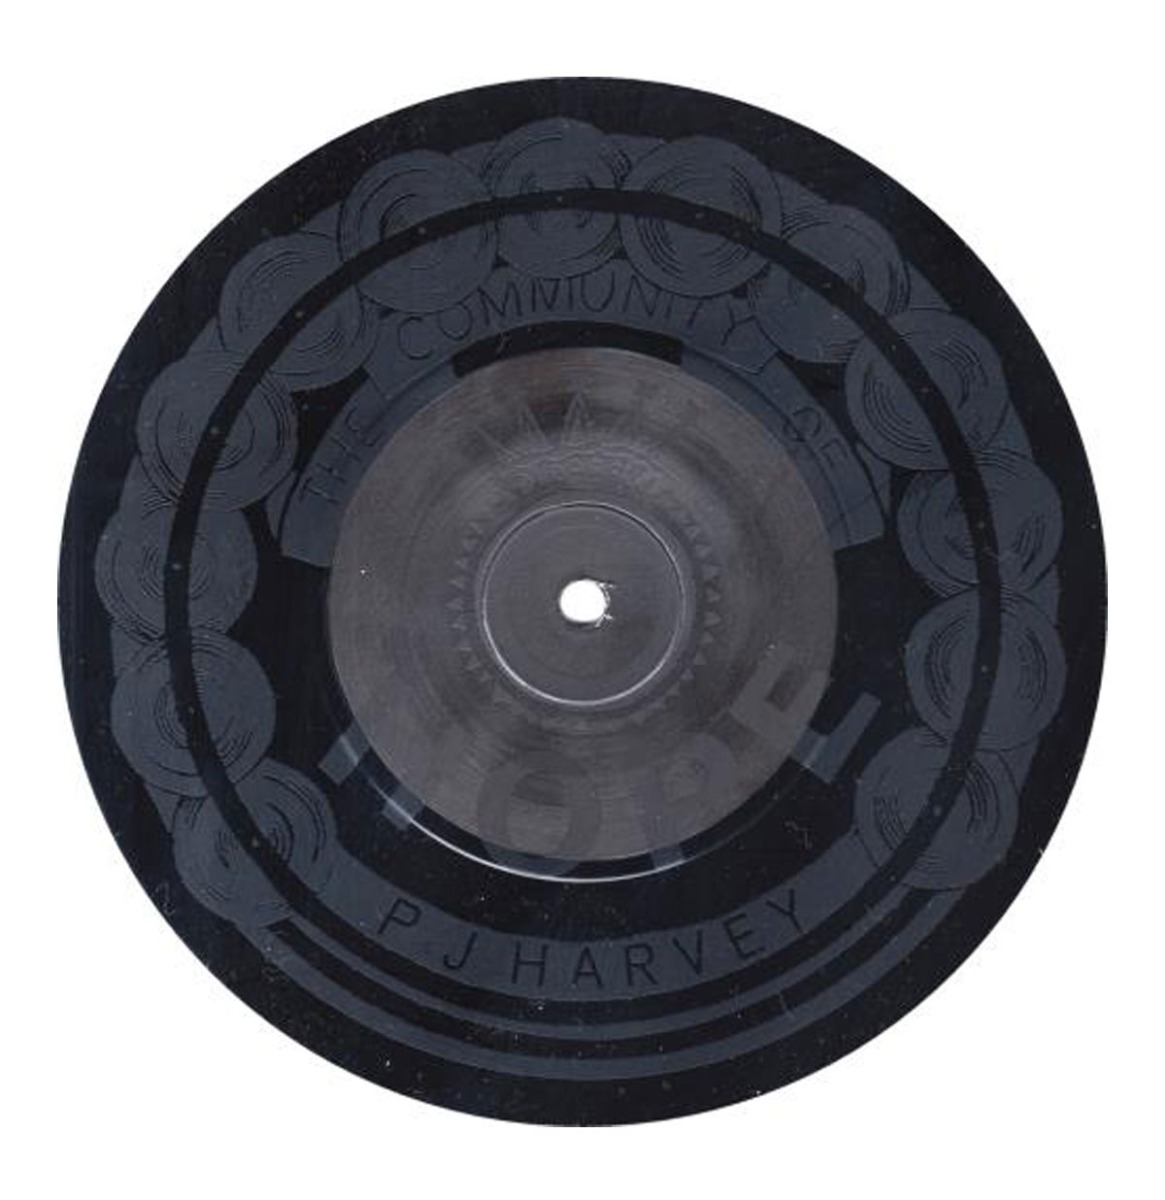 PJ Harvey - The Community of Hope Speciale Geëtste 7 Inch Single